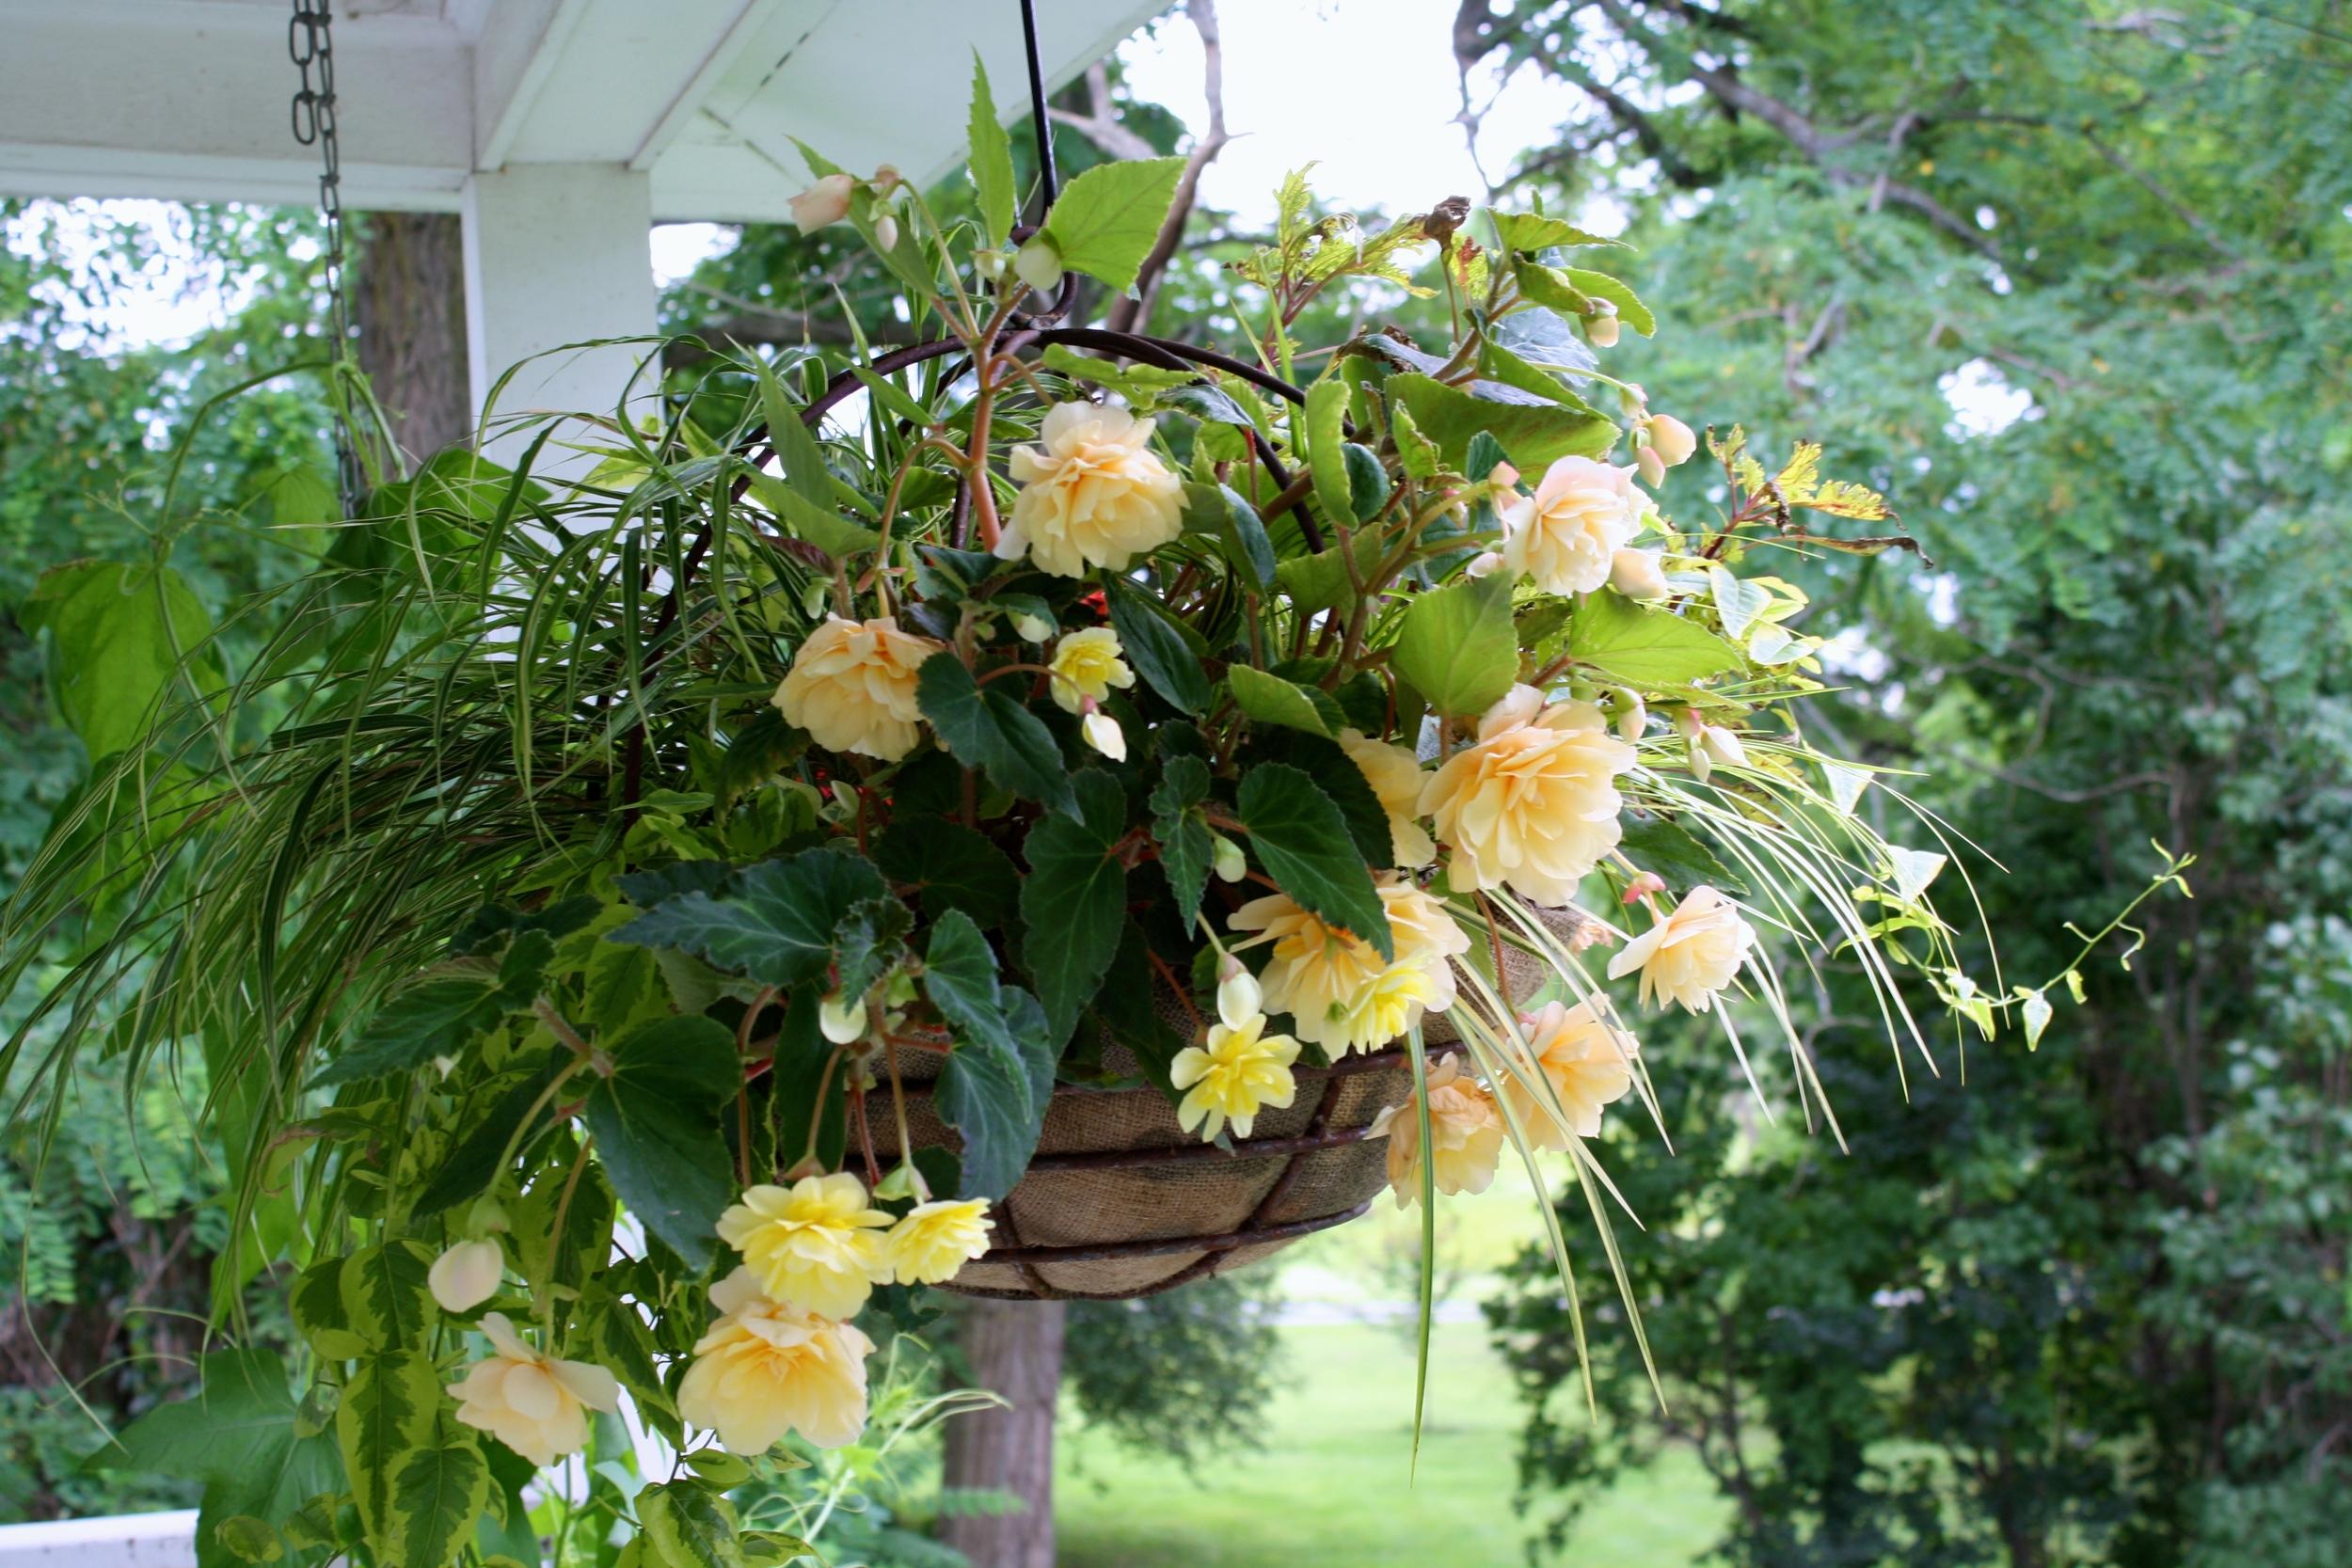 Hanging basket of 'Peaches and Cream' begonia, Acorus 'Ogon', Hakonechloa grass, Solanum jasminoides 'Variegata', Coleus 'Pineapplette'